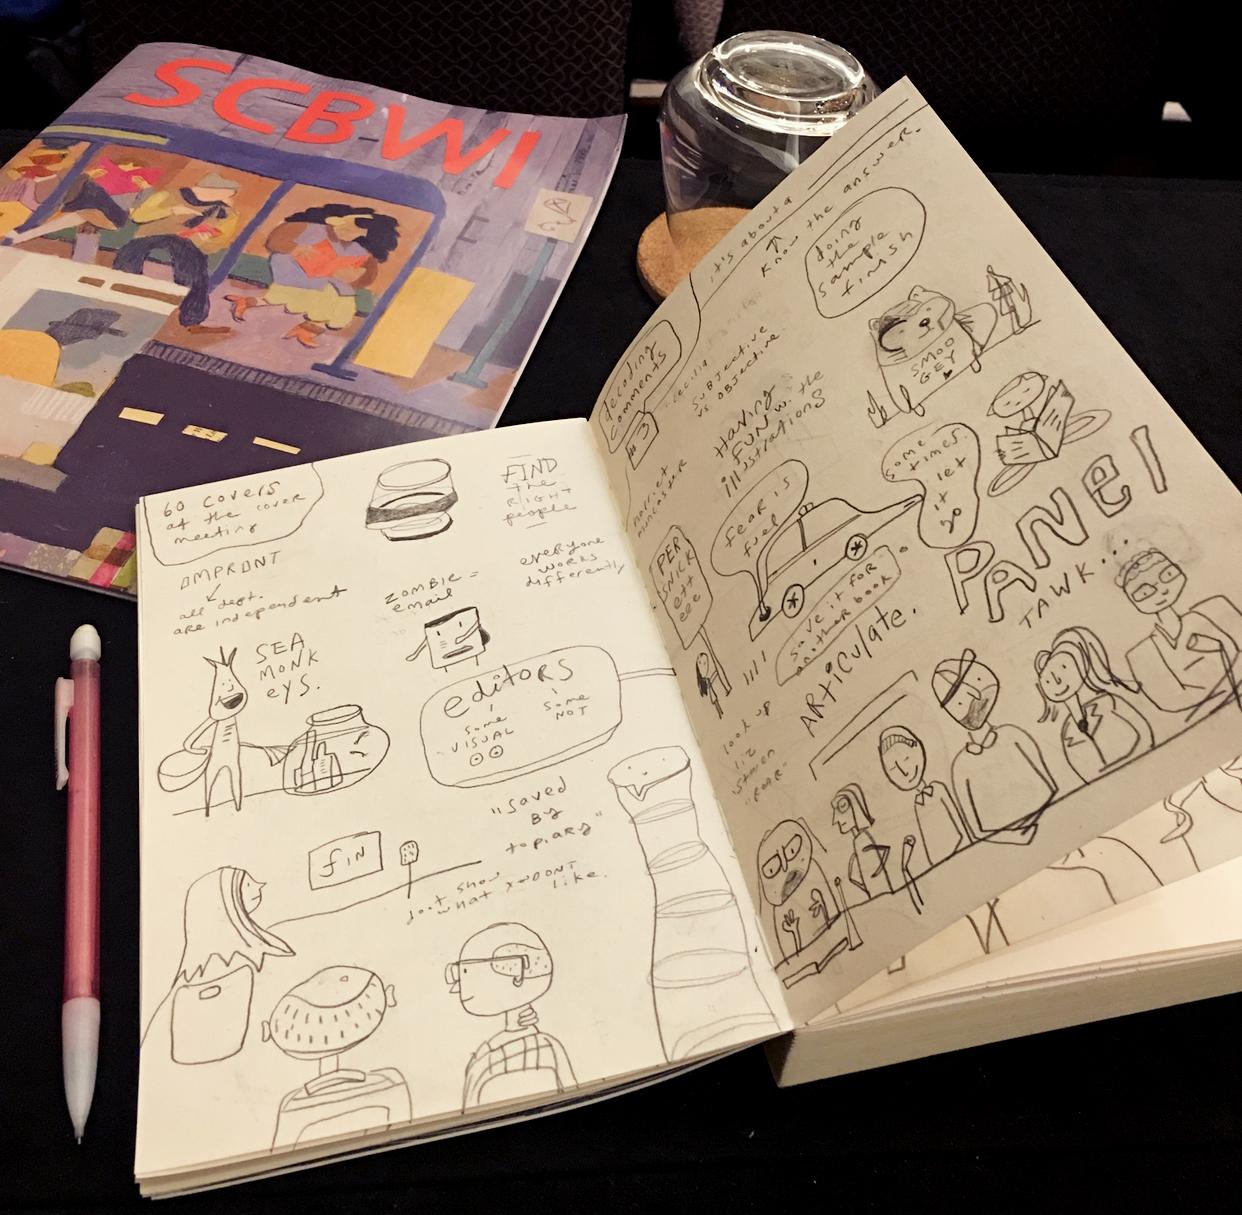 sketchingAtTheConference.jpg